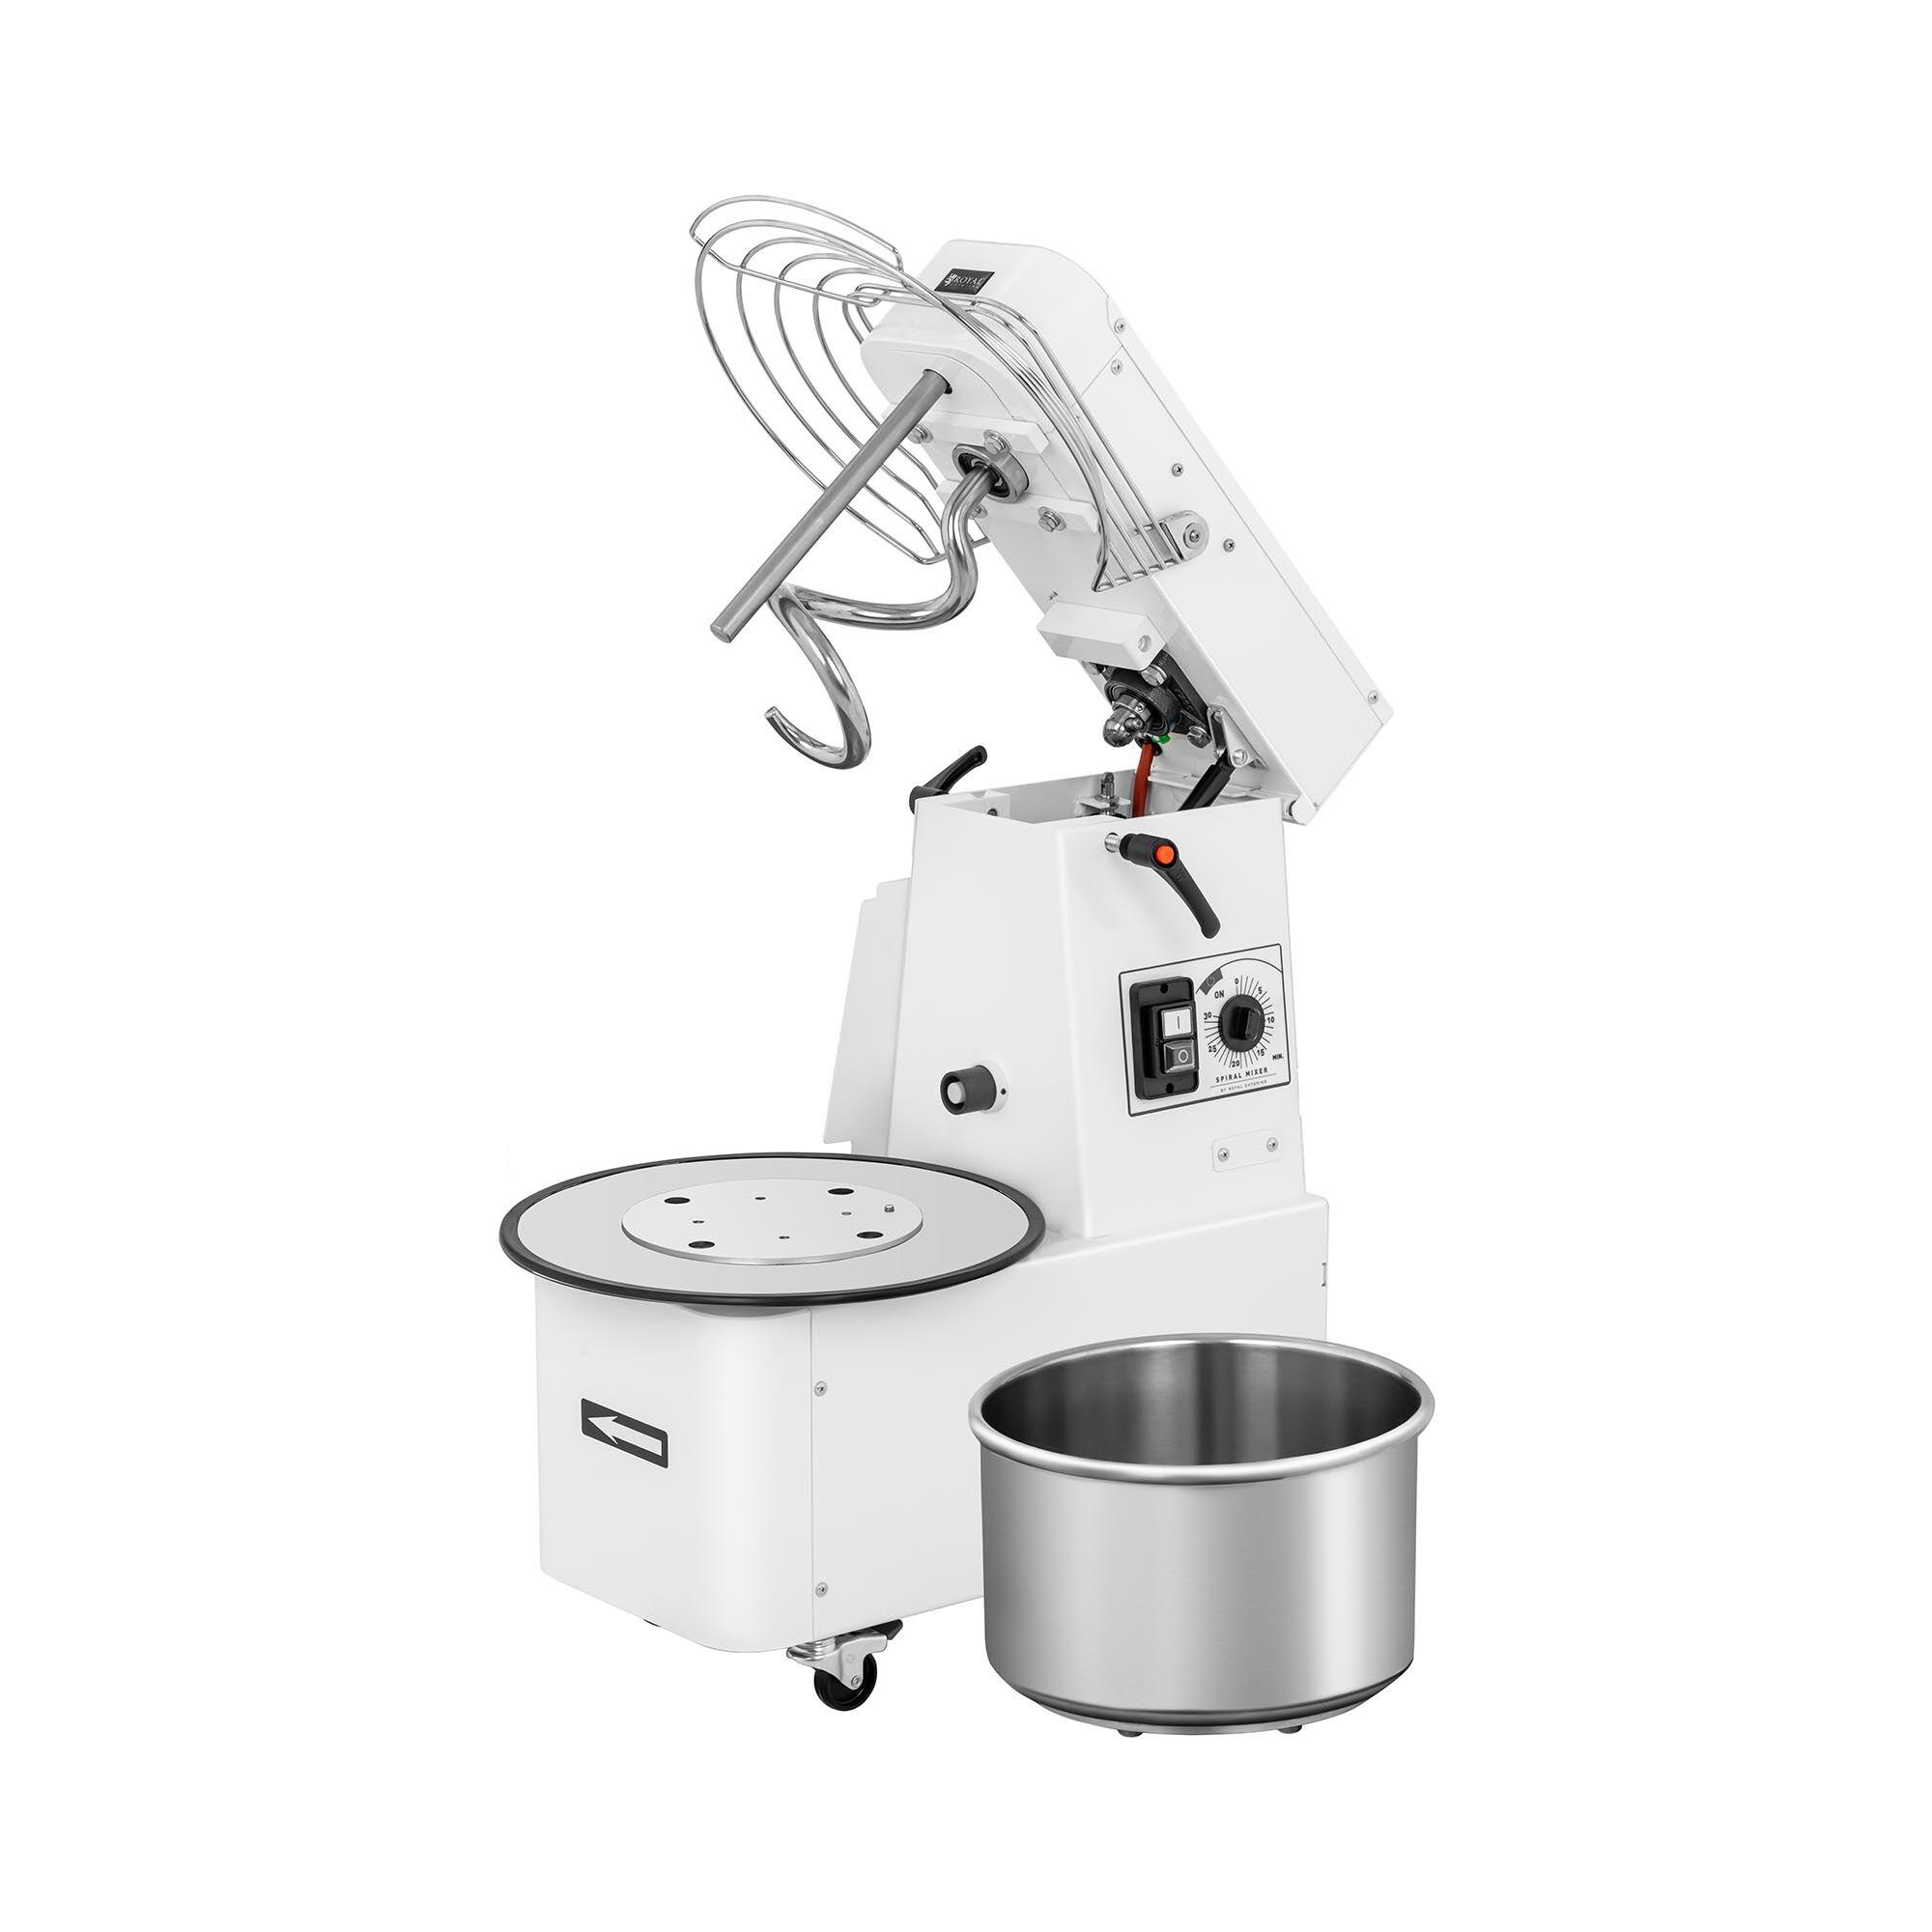 Royal Catering Impastatrice professionale a spirale - 15 litri - 48 kg/h - 750 W - Testa pieghevole RC-SMRH15